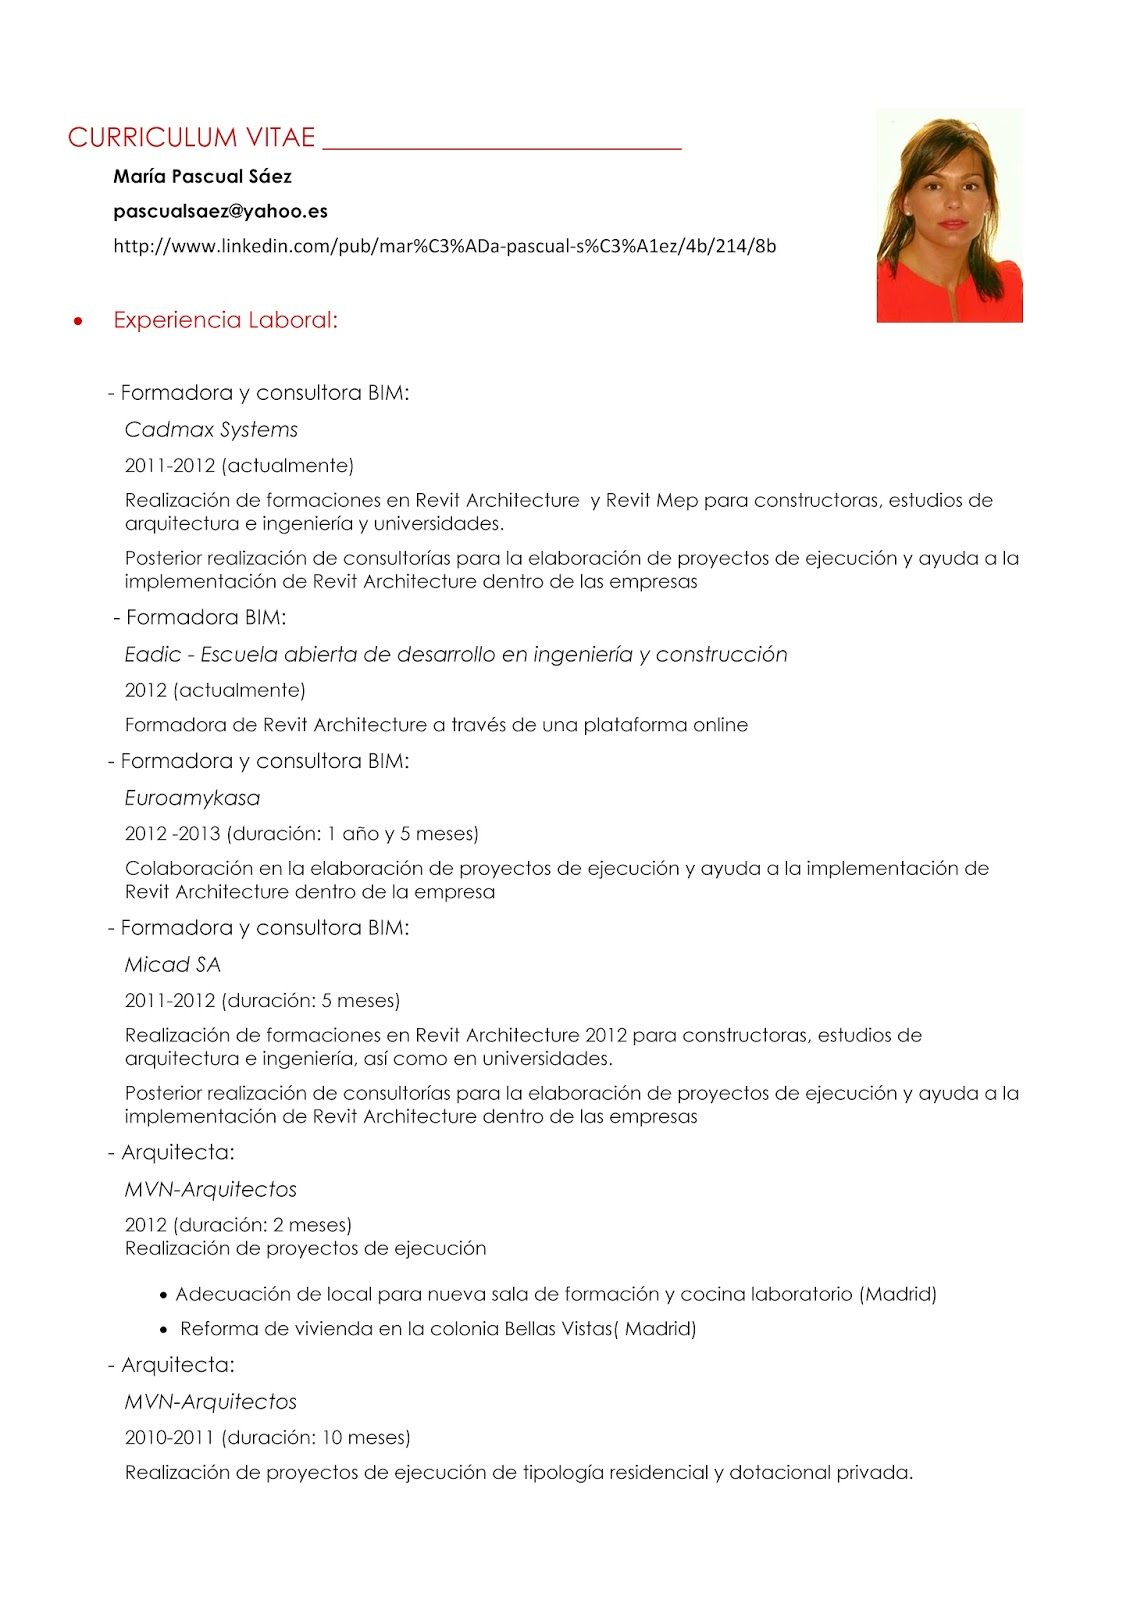 Bonito Linkedin Curriculum Vitae Motivo - Colección De Plantillas De ...